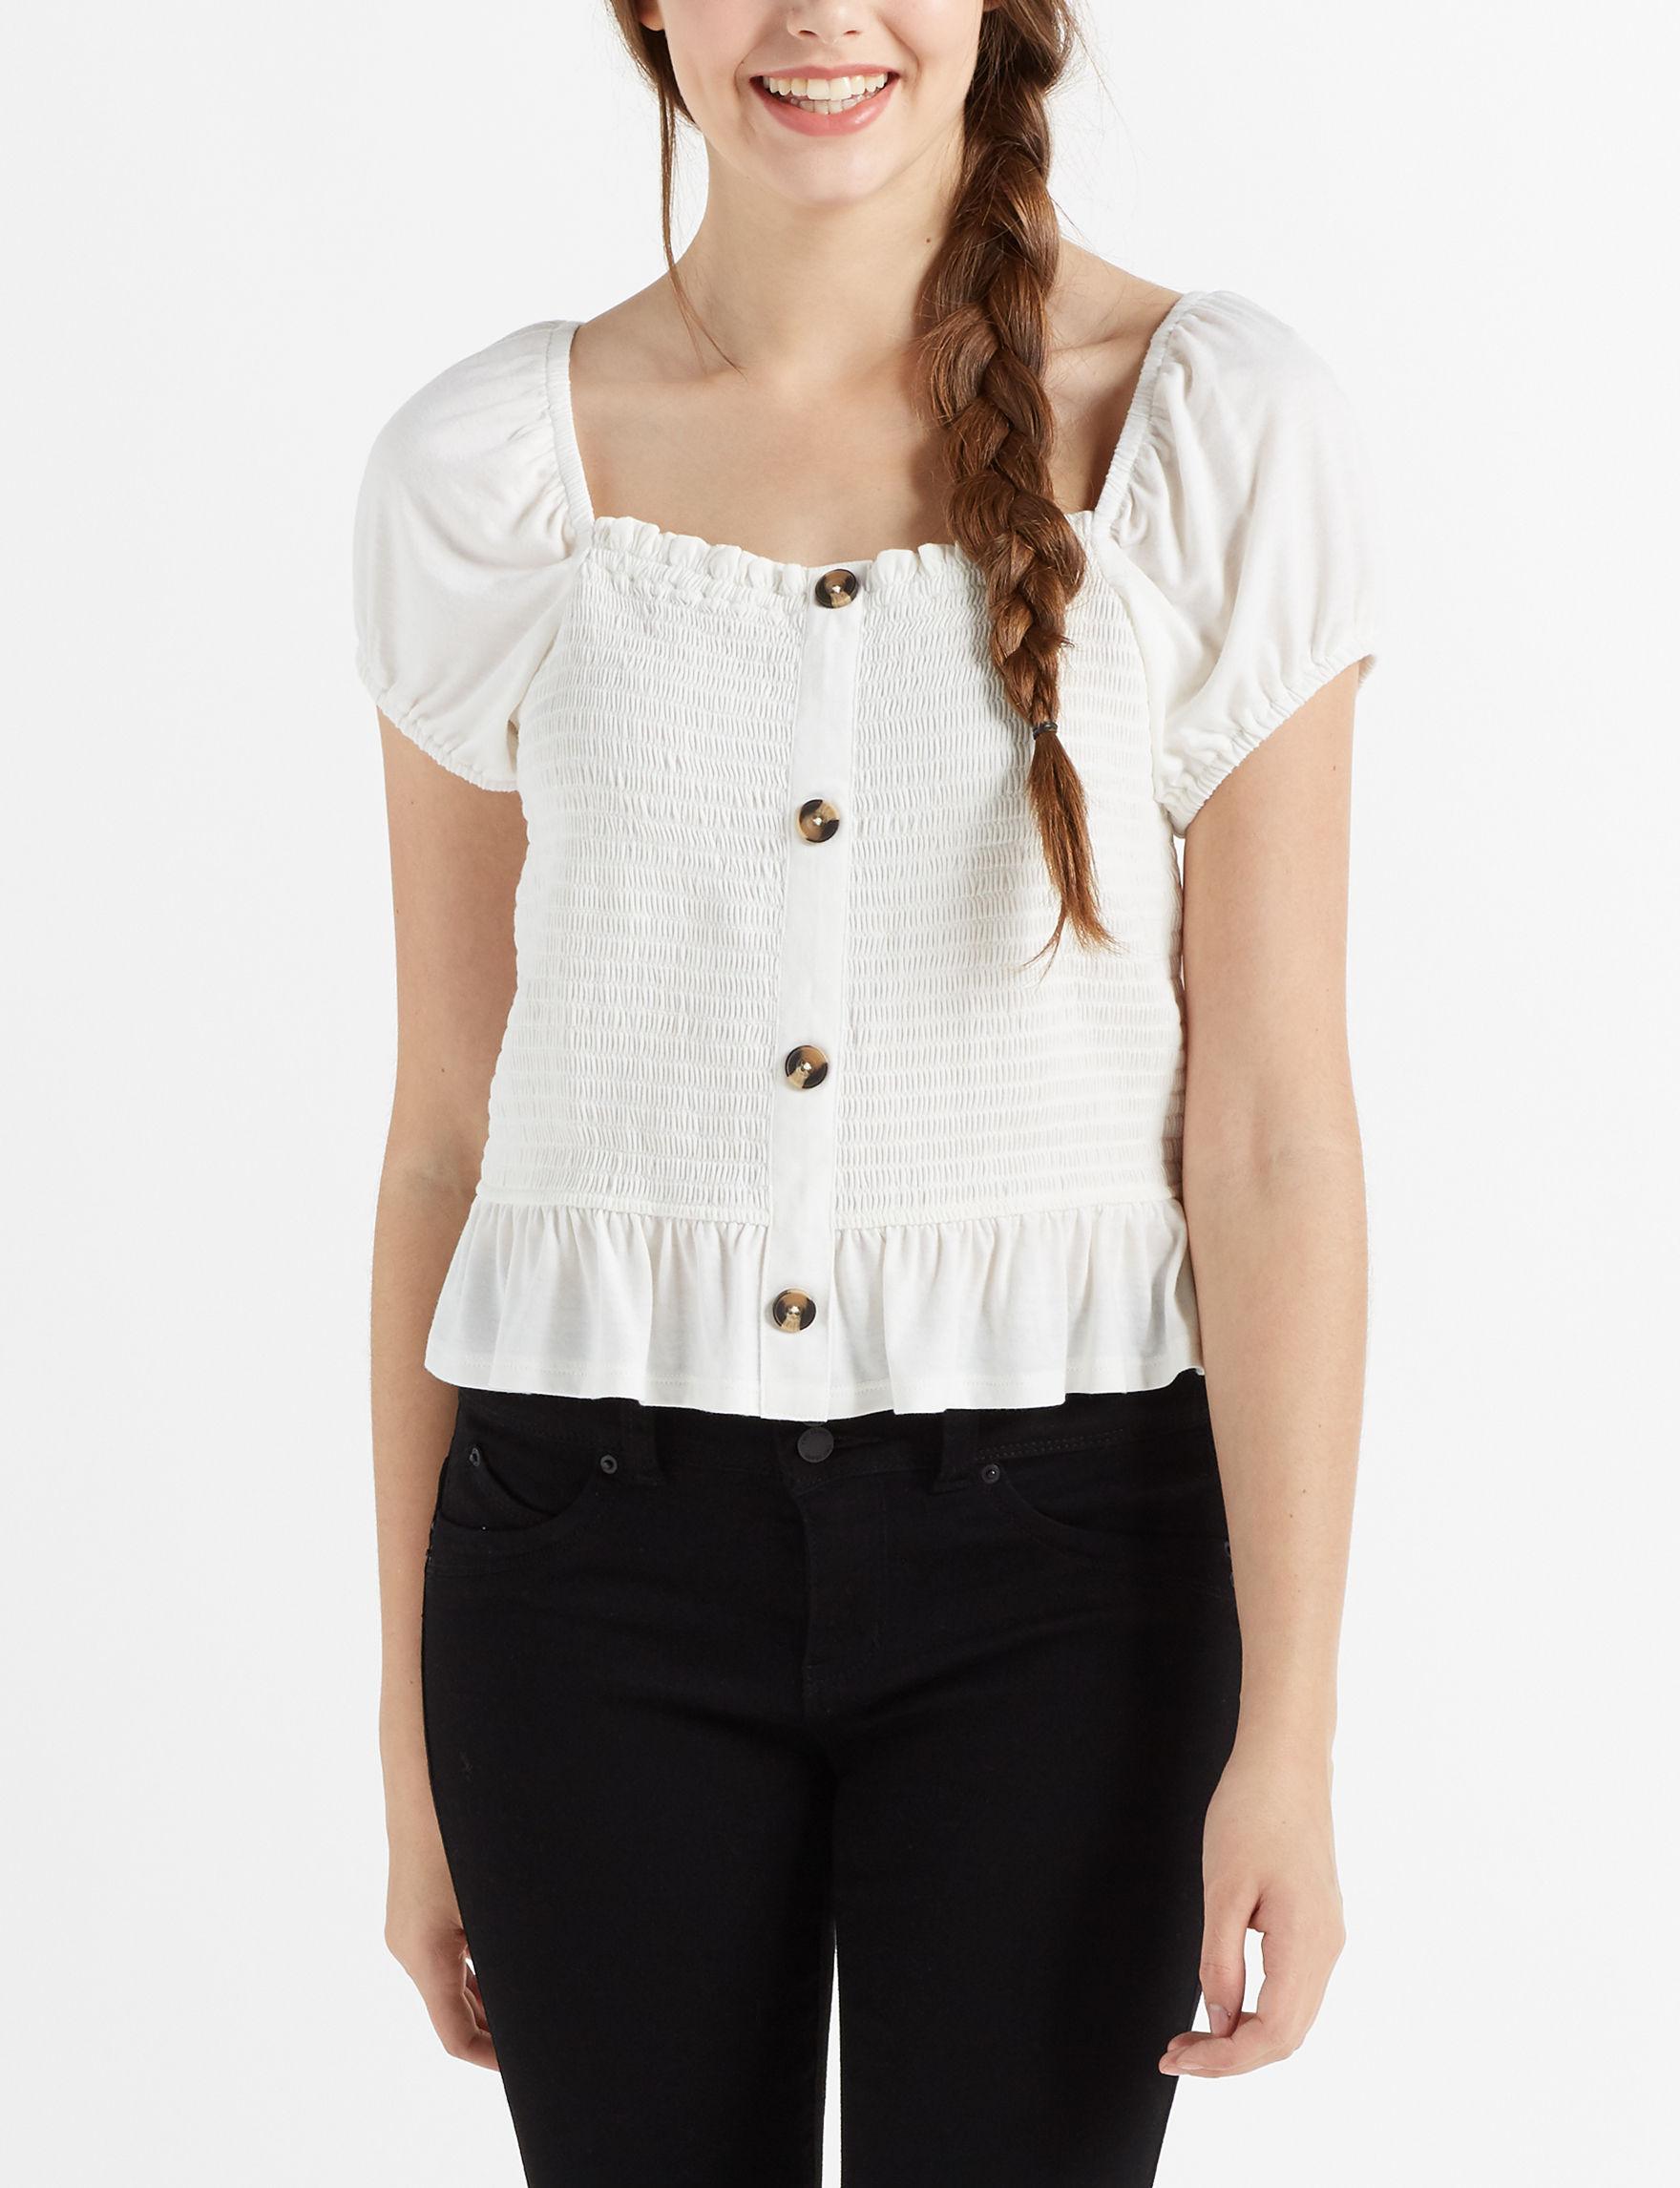 Avalon Apparel Ivory Shirts & Blouses